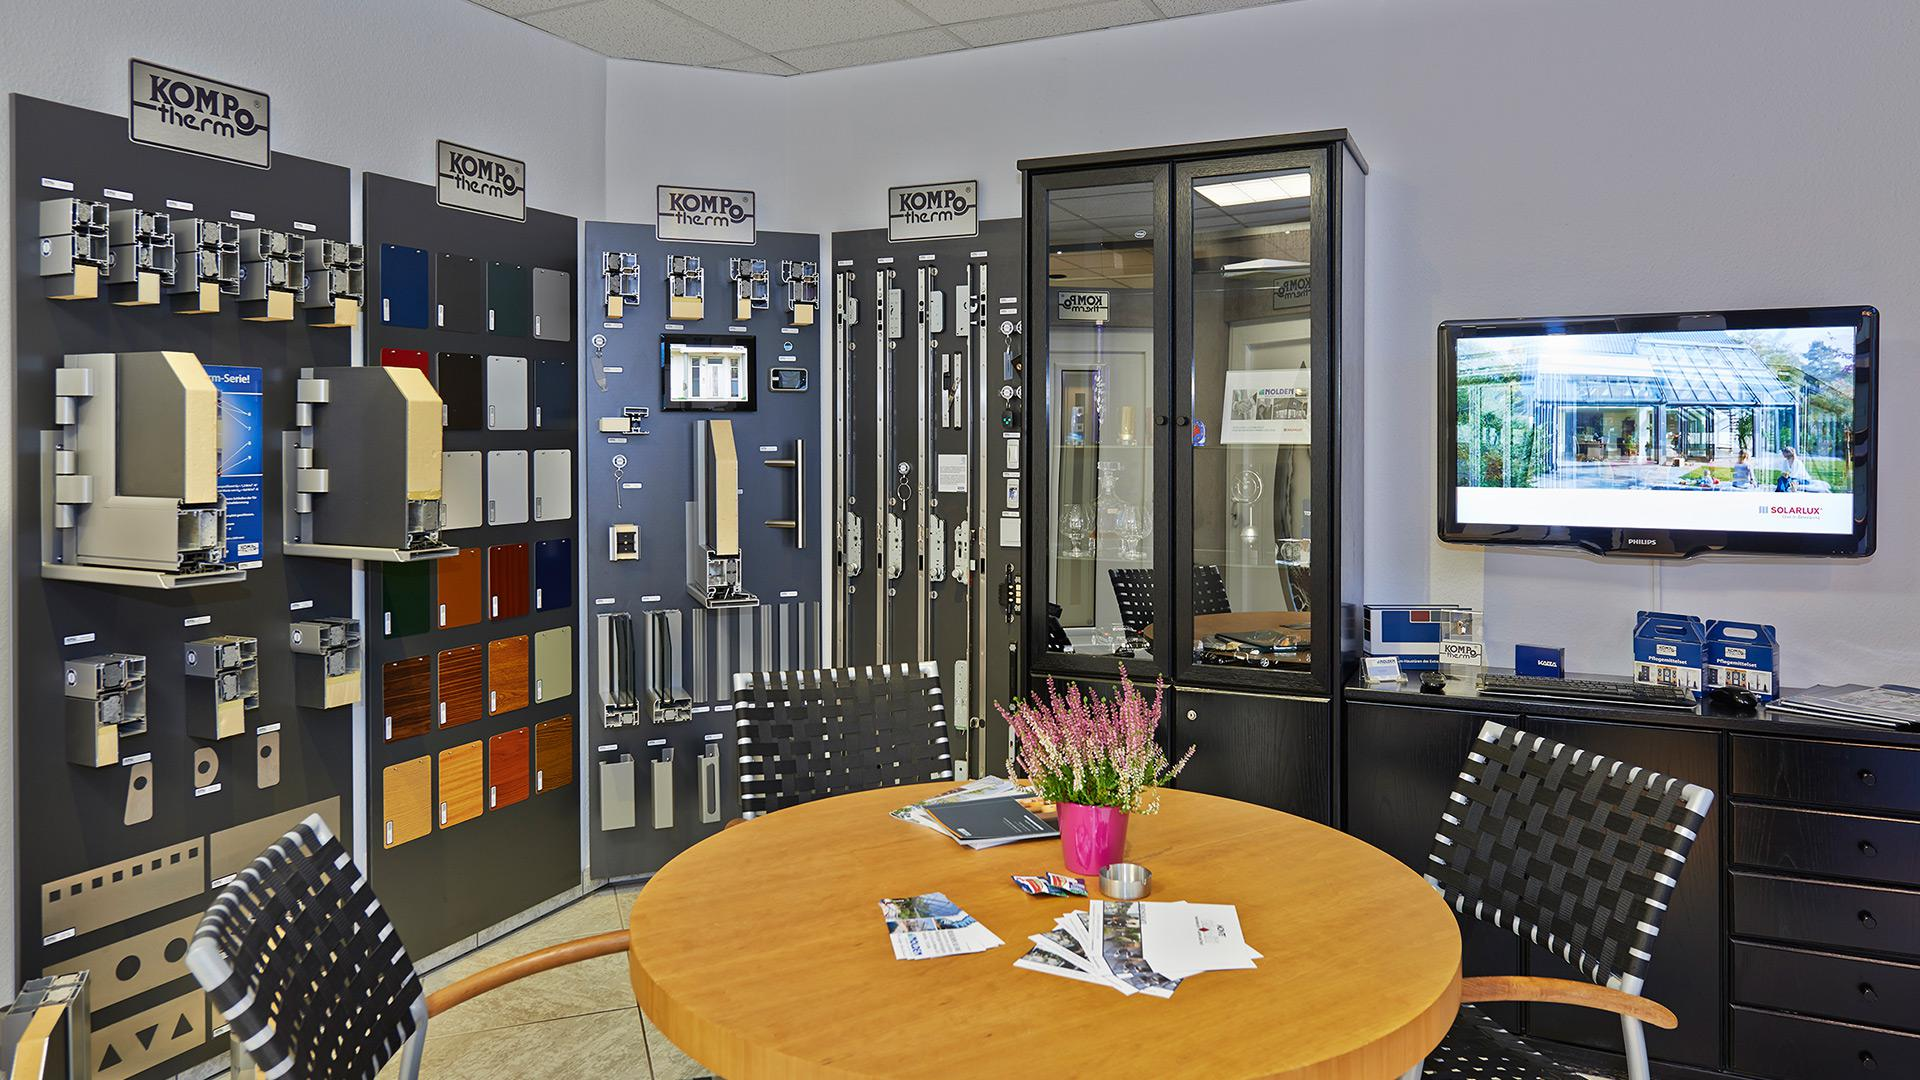 Besprechungsbereich in der Nolden Ausstellung mit vielen Produktmuster an der Wand